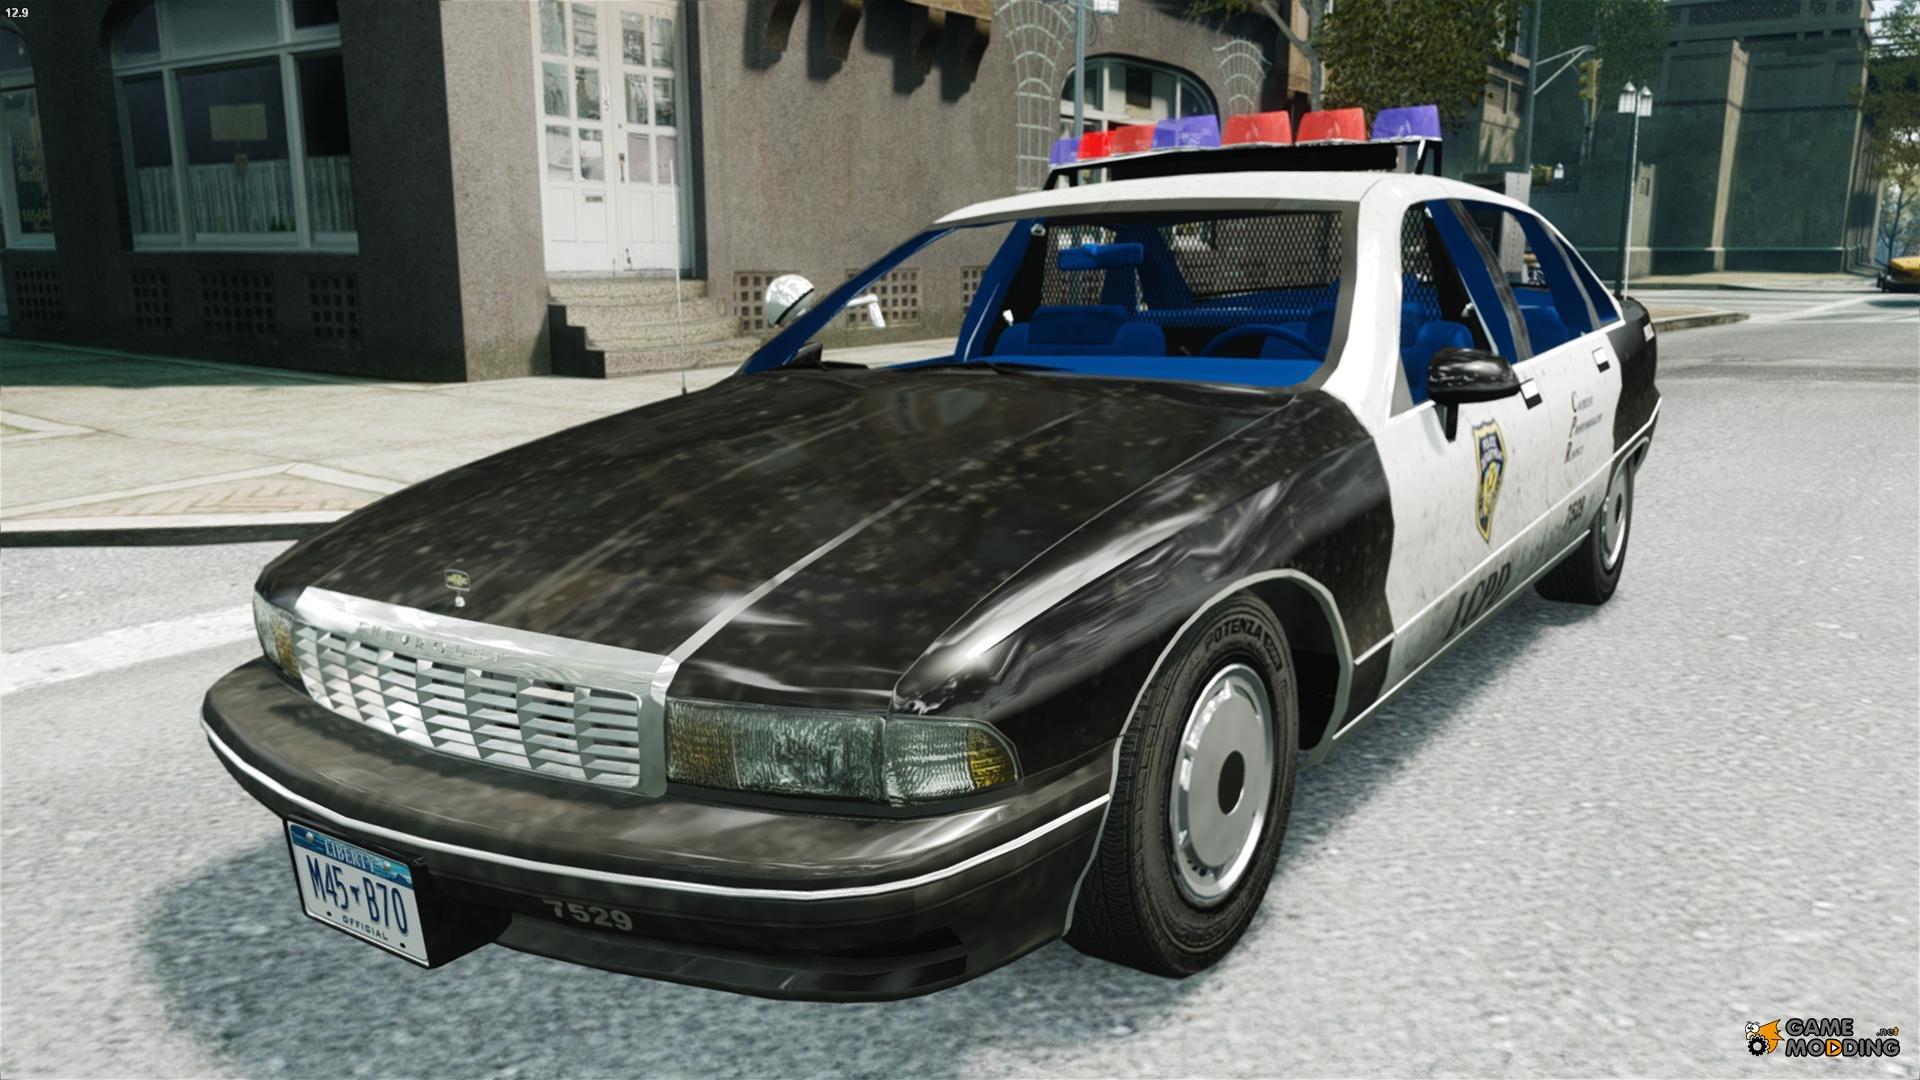 chevrolet-caprice-police-car-1920%C3%971080-wallpaper-wpc9001221